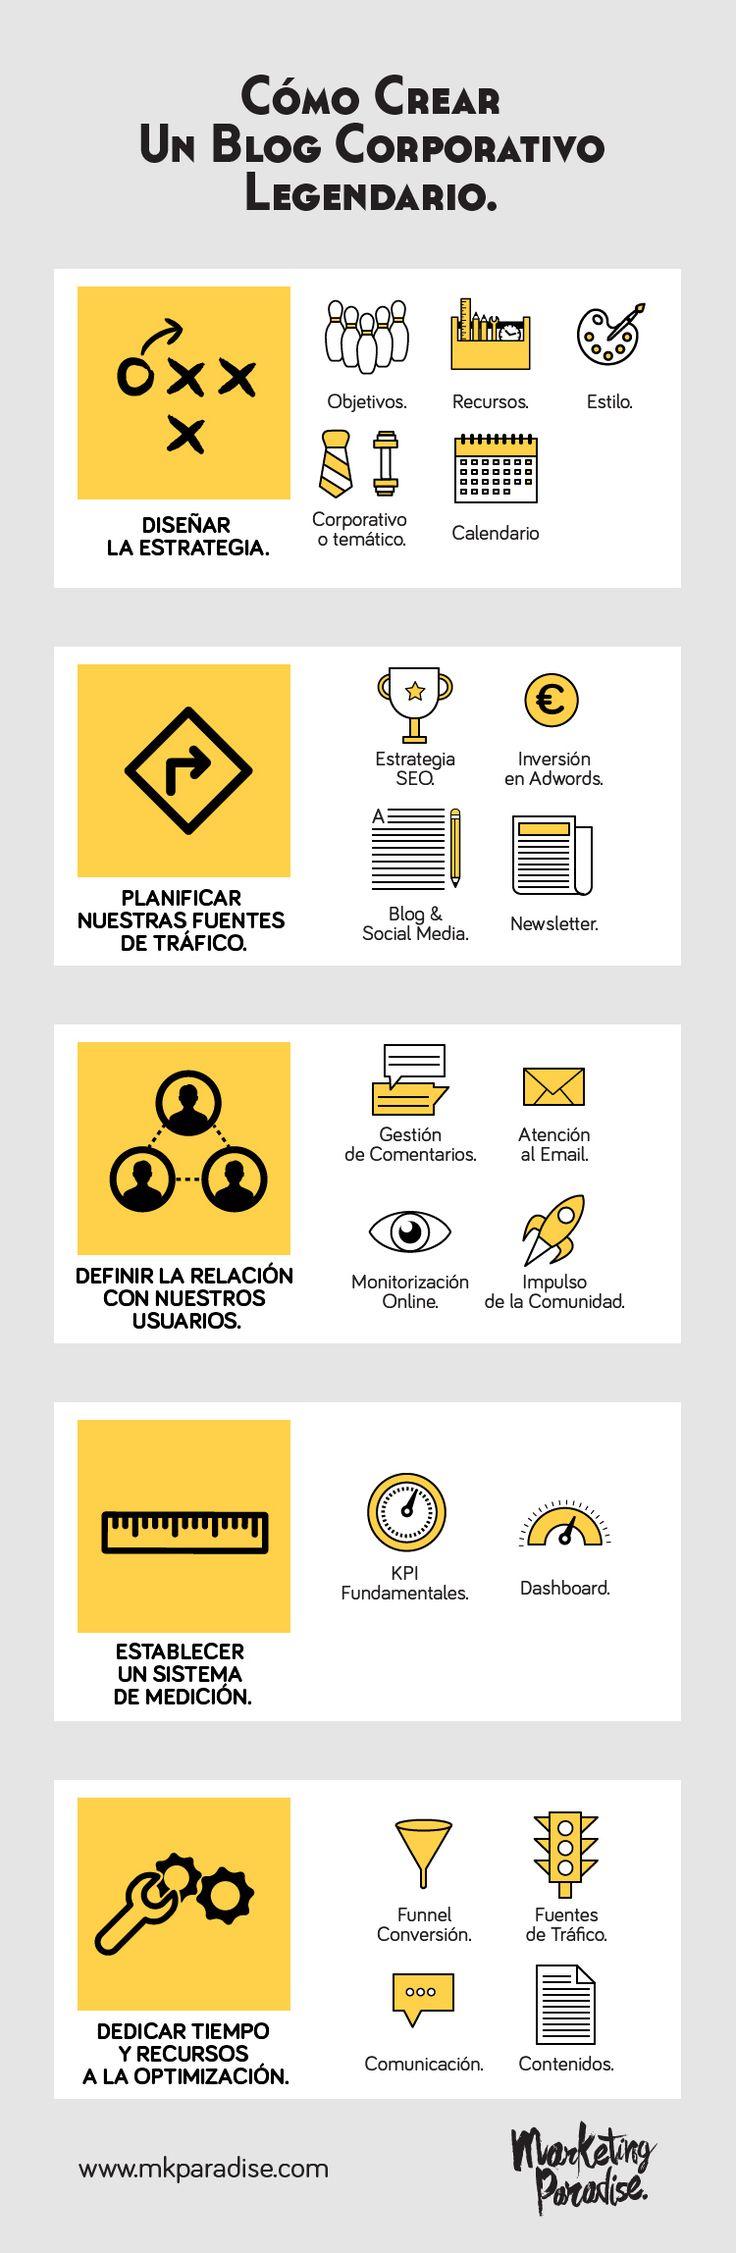 Cómo crear un Blog corporativo de leyenda #infografia #infographic #socialmedia